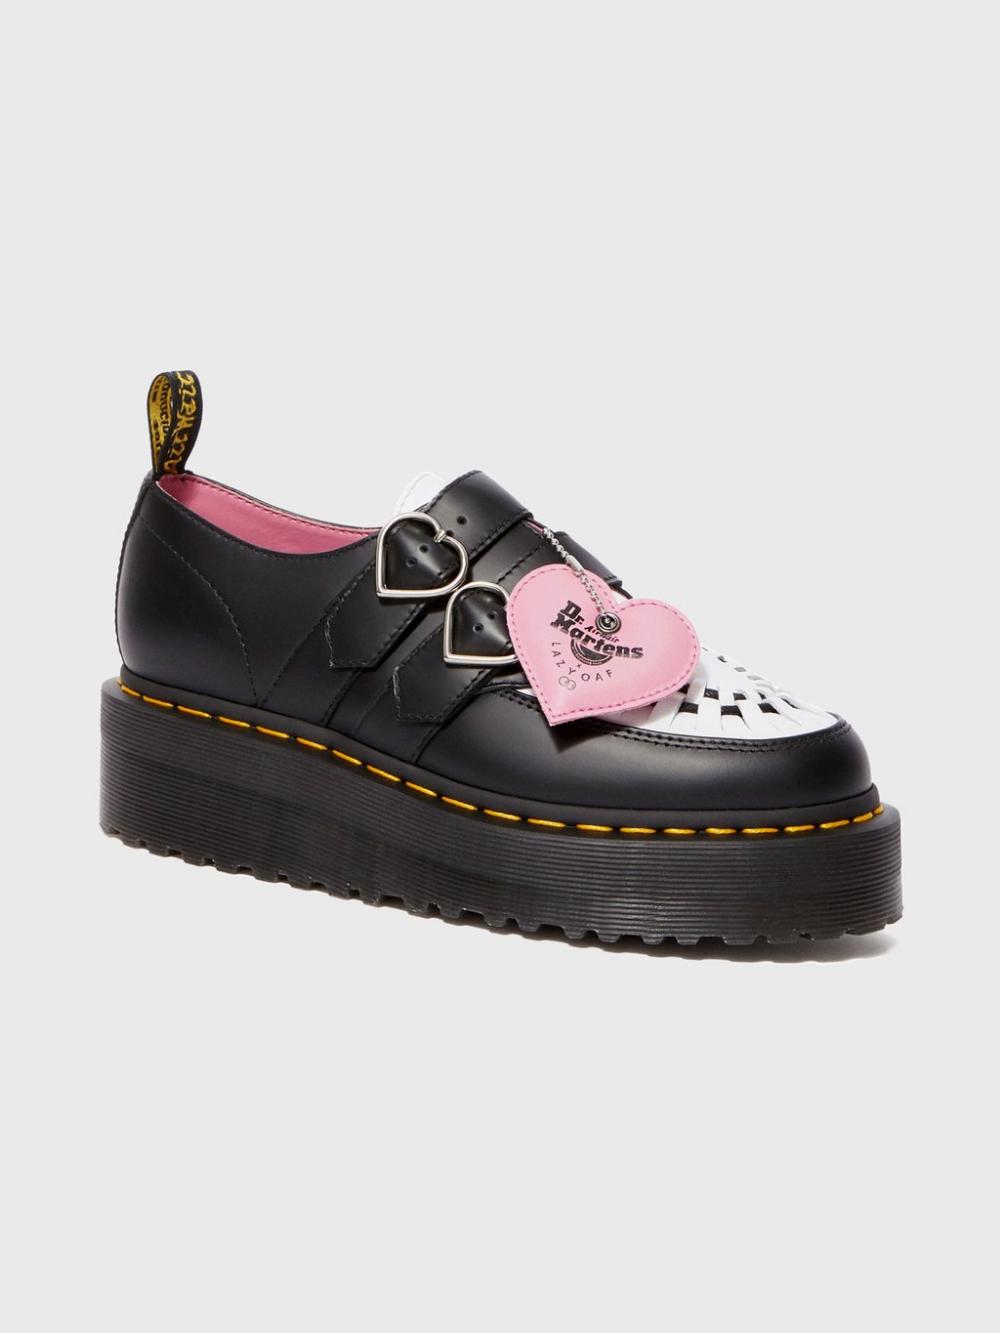 Dr. Martens x Lazy Oaf | Schuhe